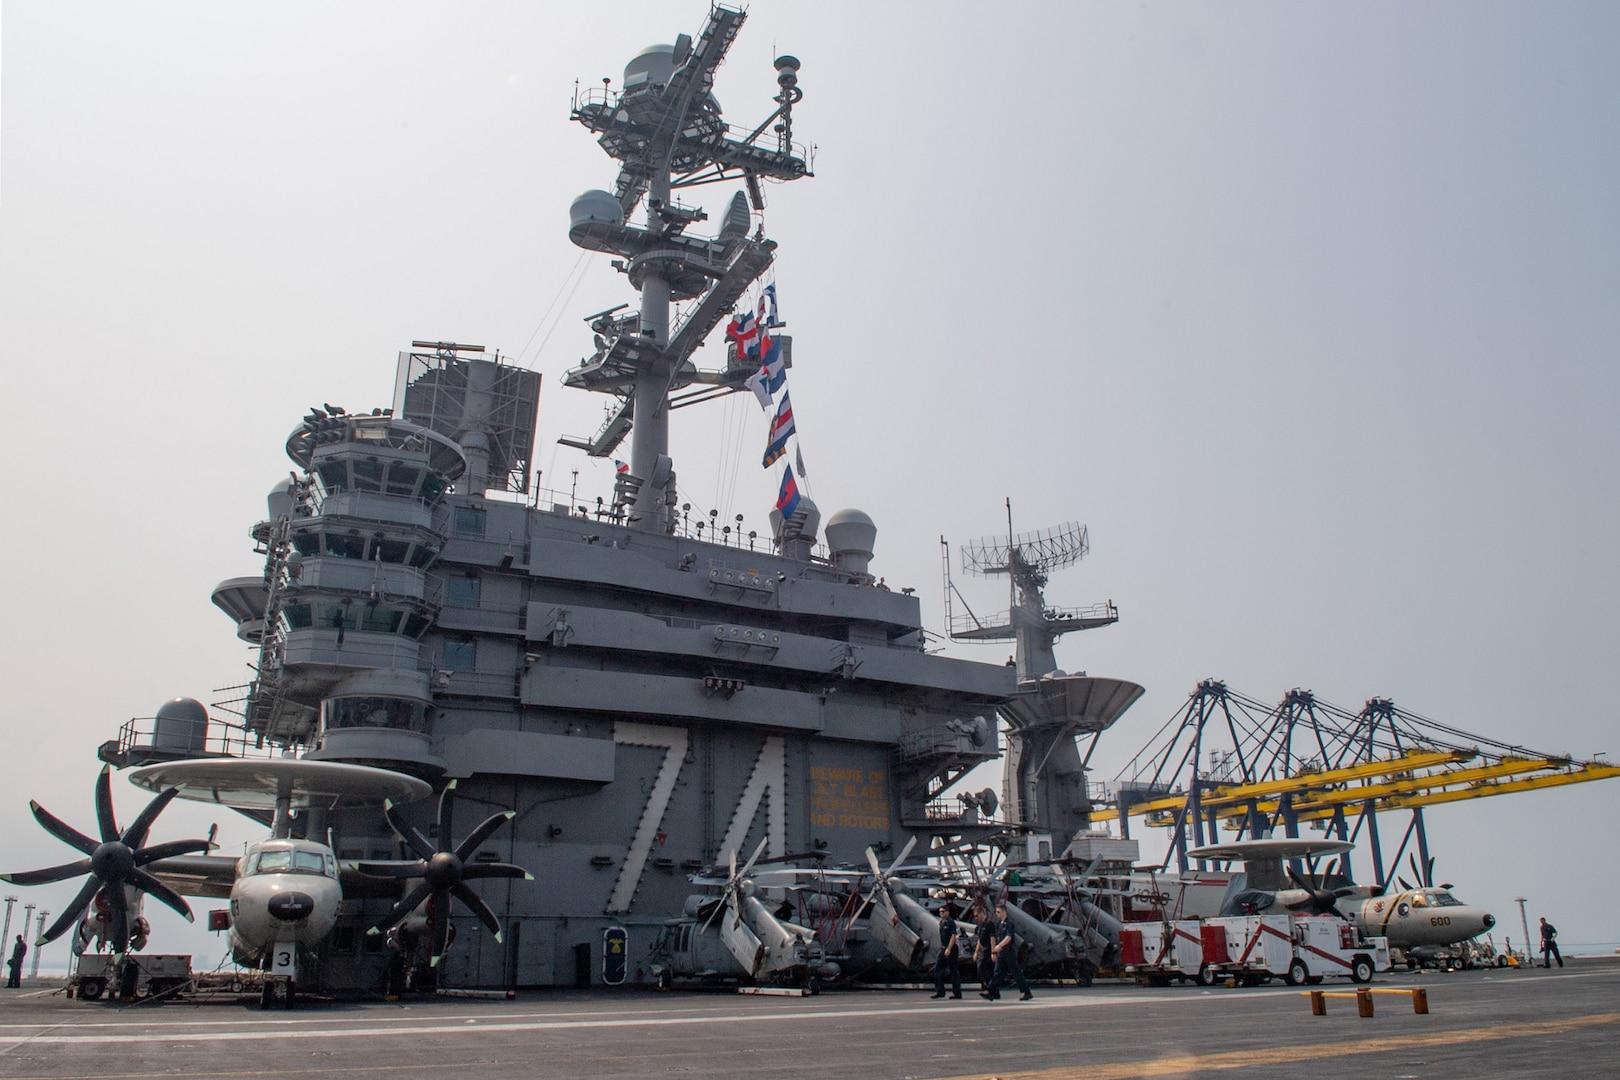 USS John C. Stennis Arrives in Thailand for Port Visit